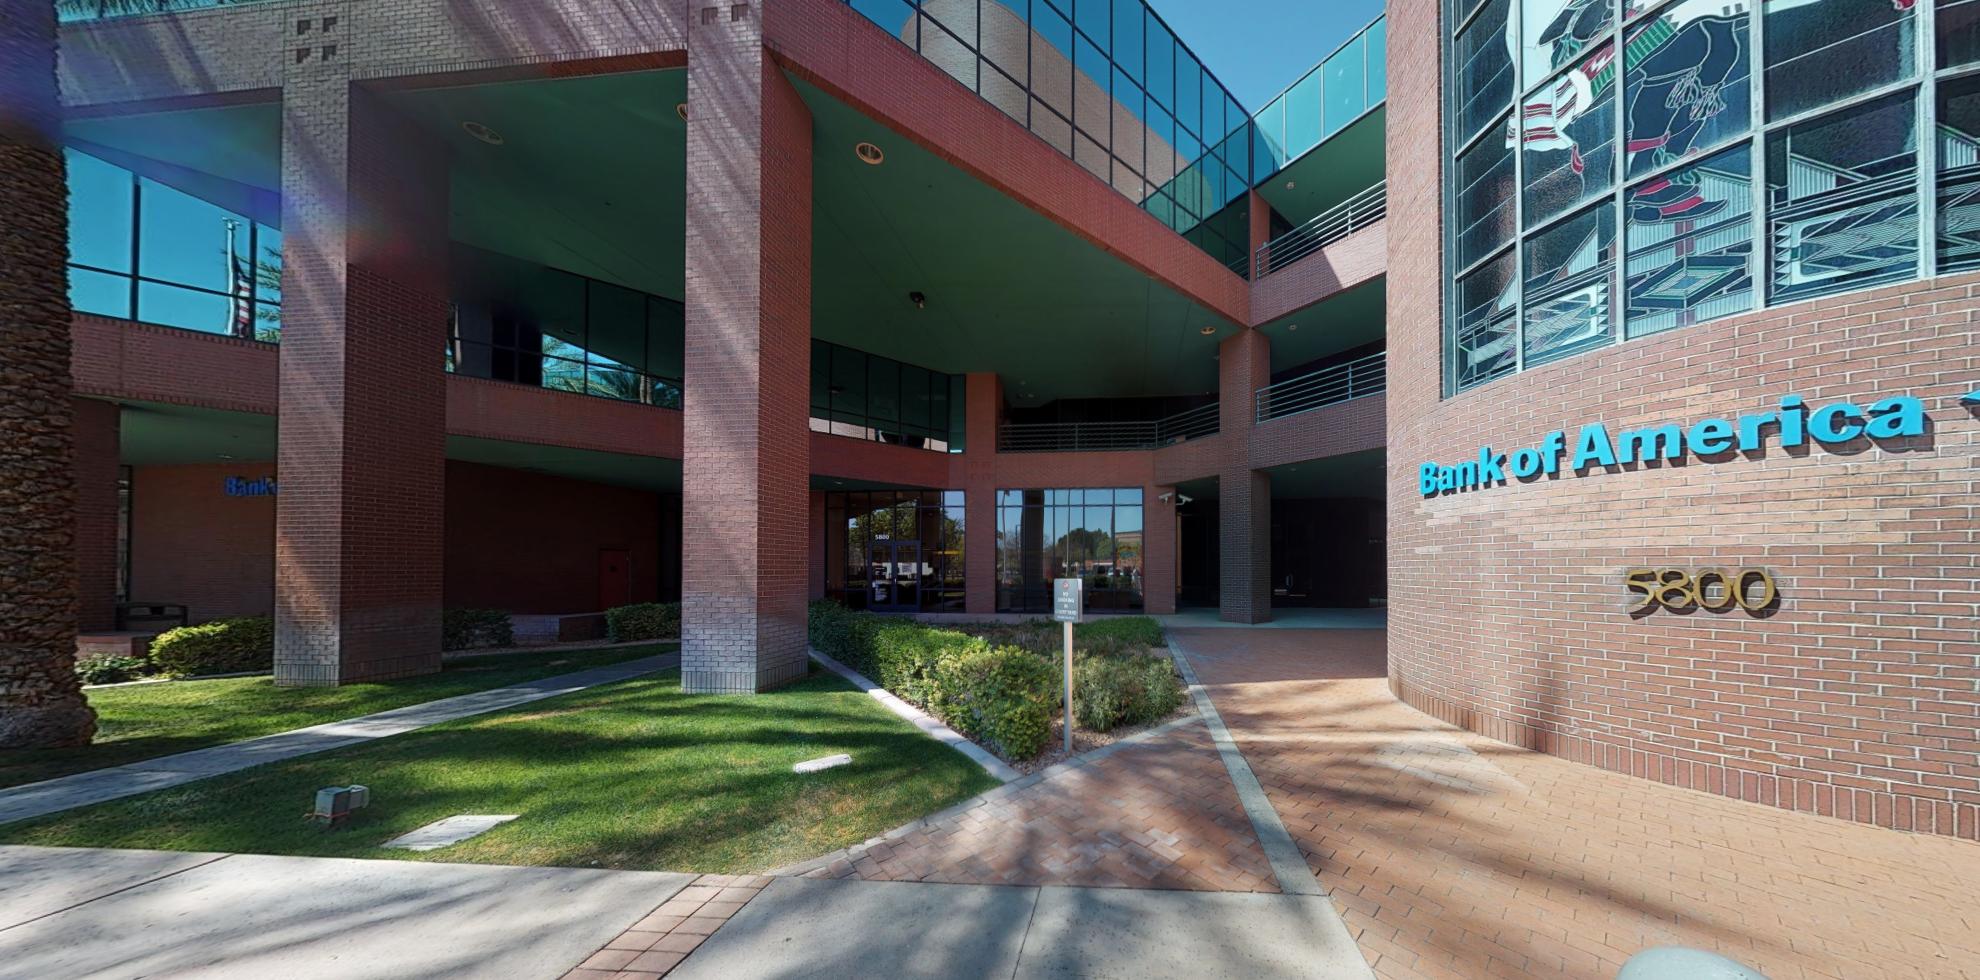 Bank of America financial center with drive-thru ATM | 5800 W Glenn Dr, Glendale, AZ 85301